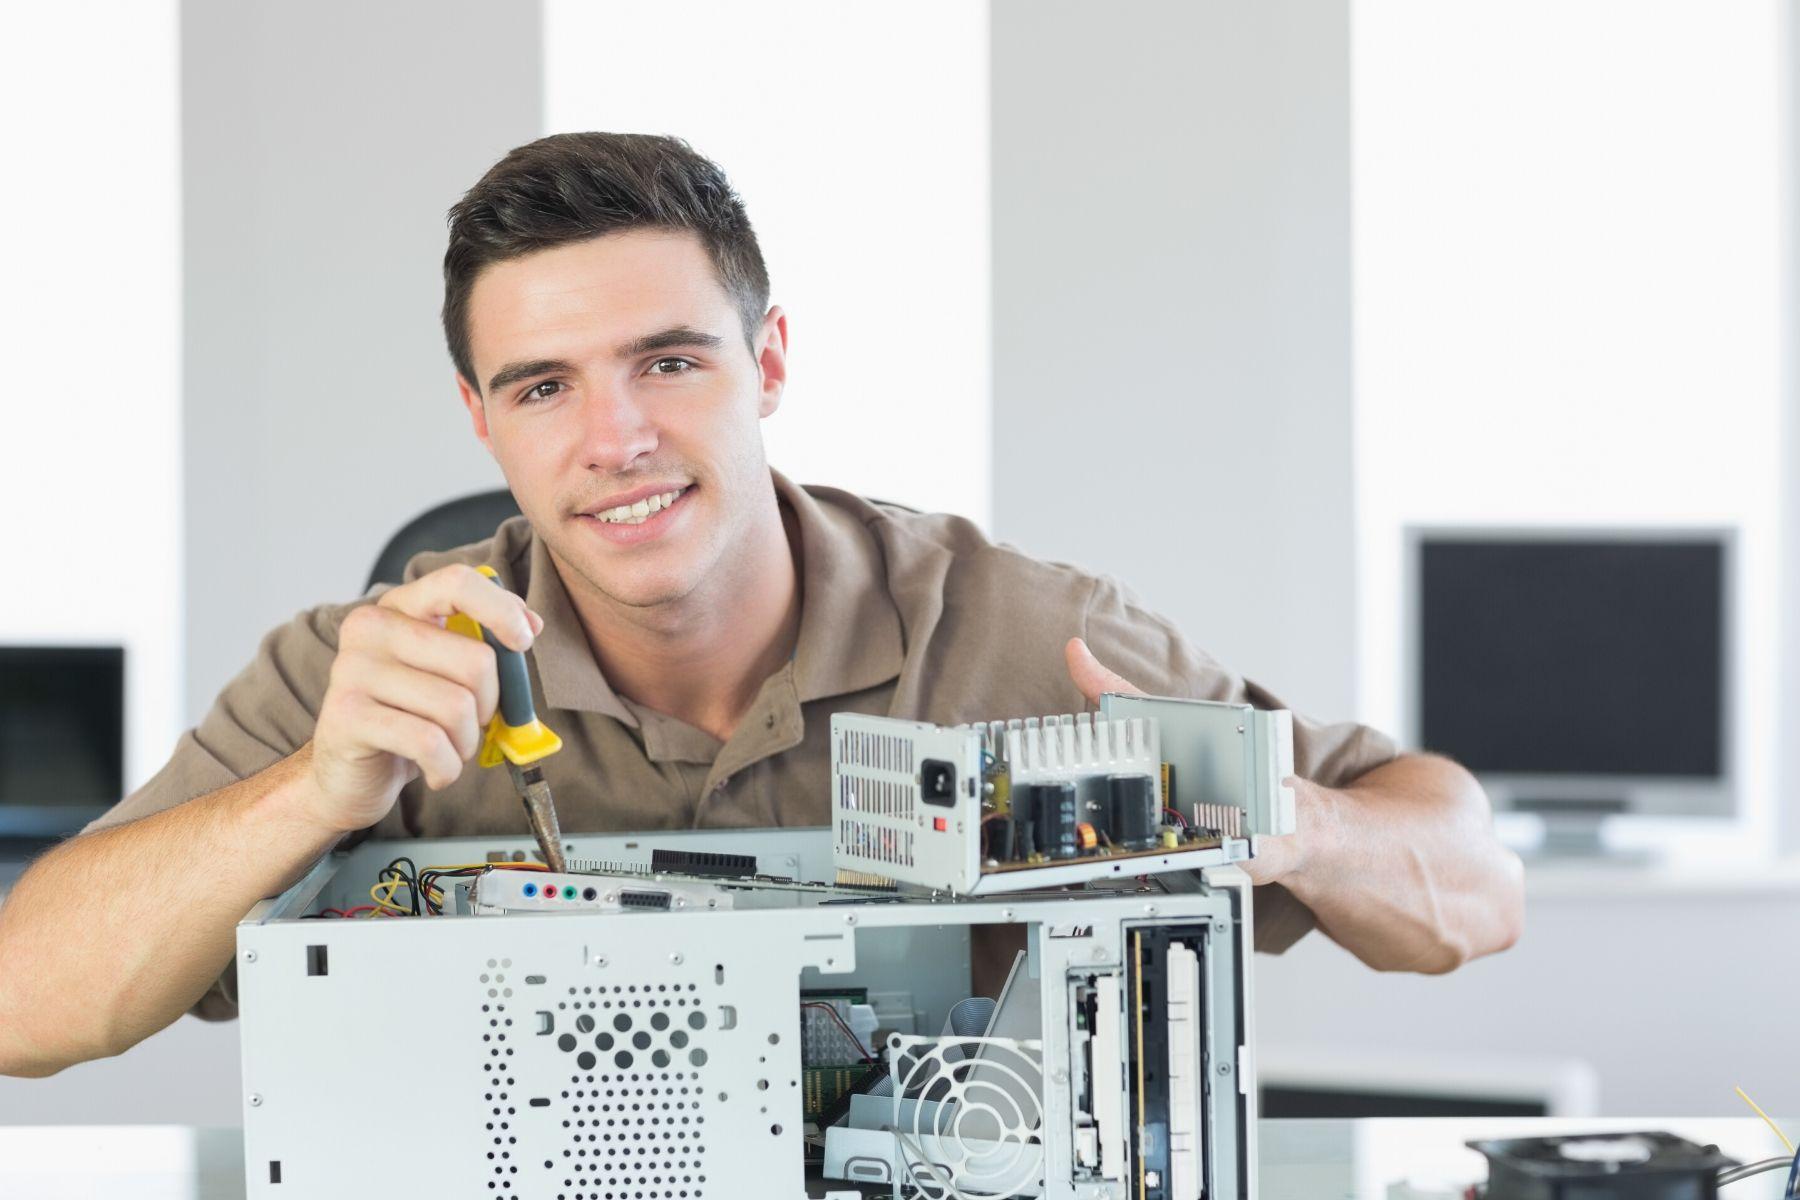 Computer Engineer Image